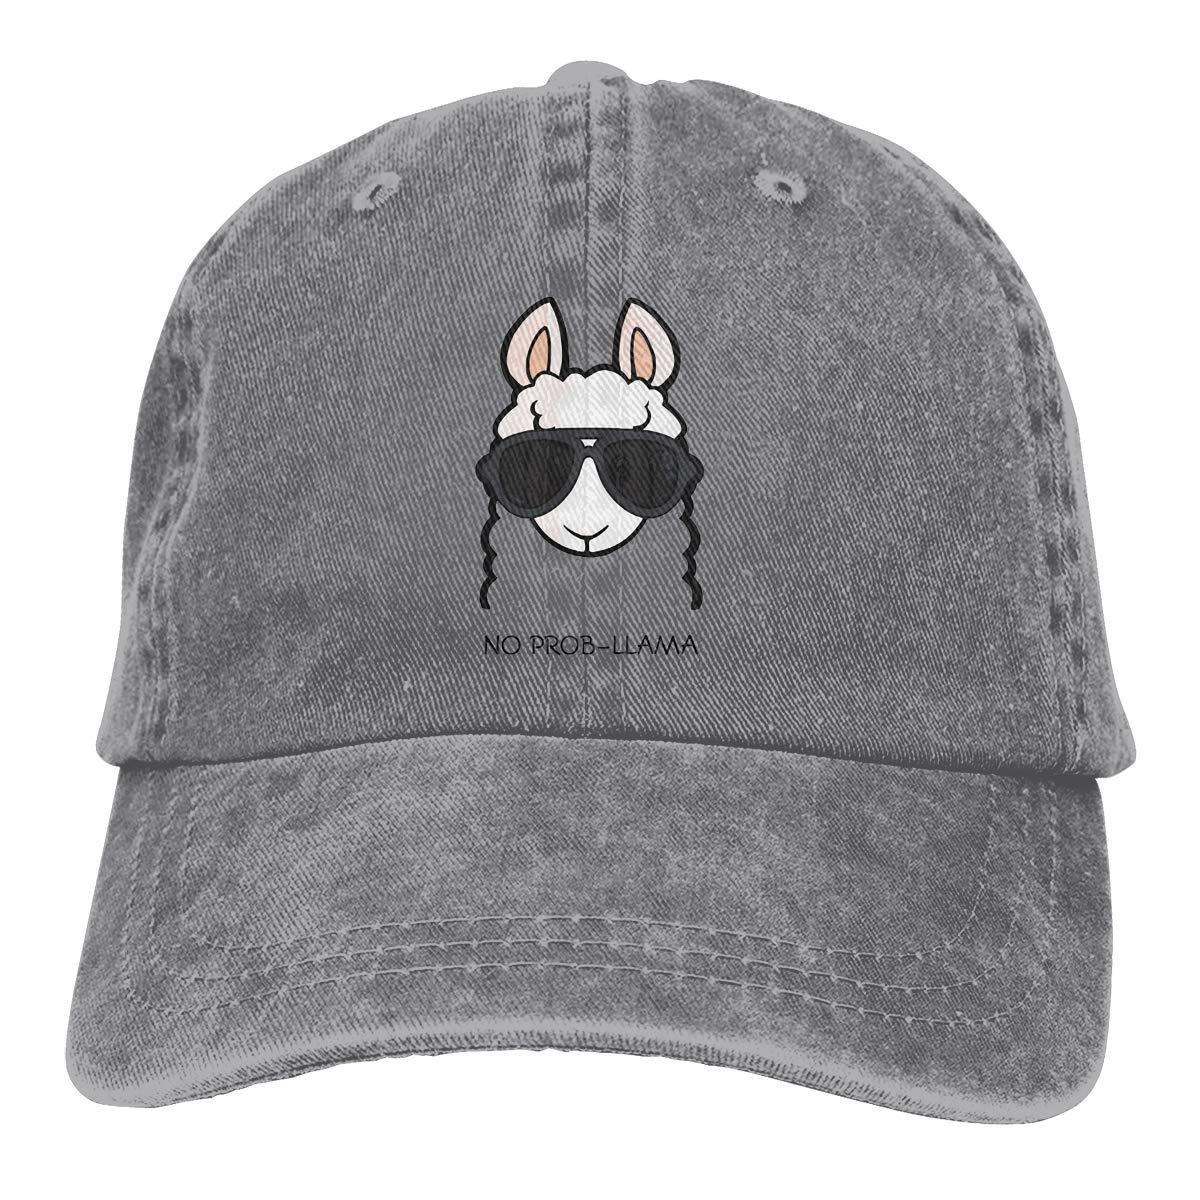 Adult Unisex Cowboy Cap Adjustable Hat No Prob Llama Cotton Denim